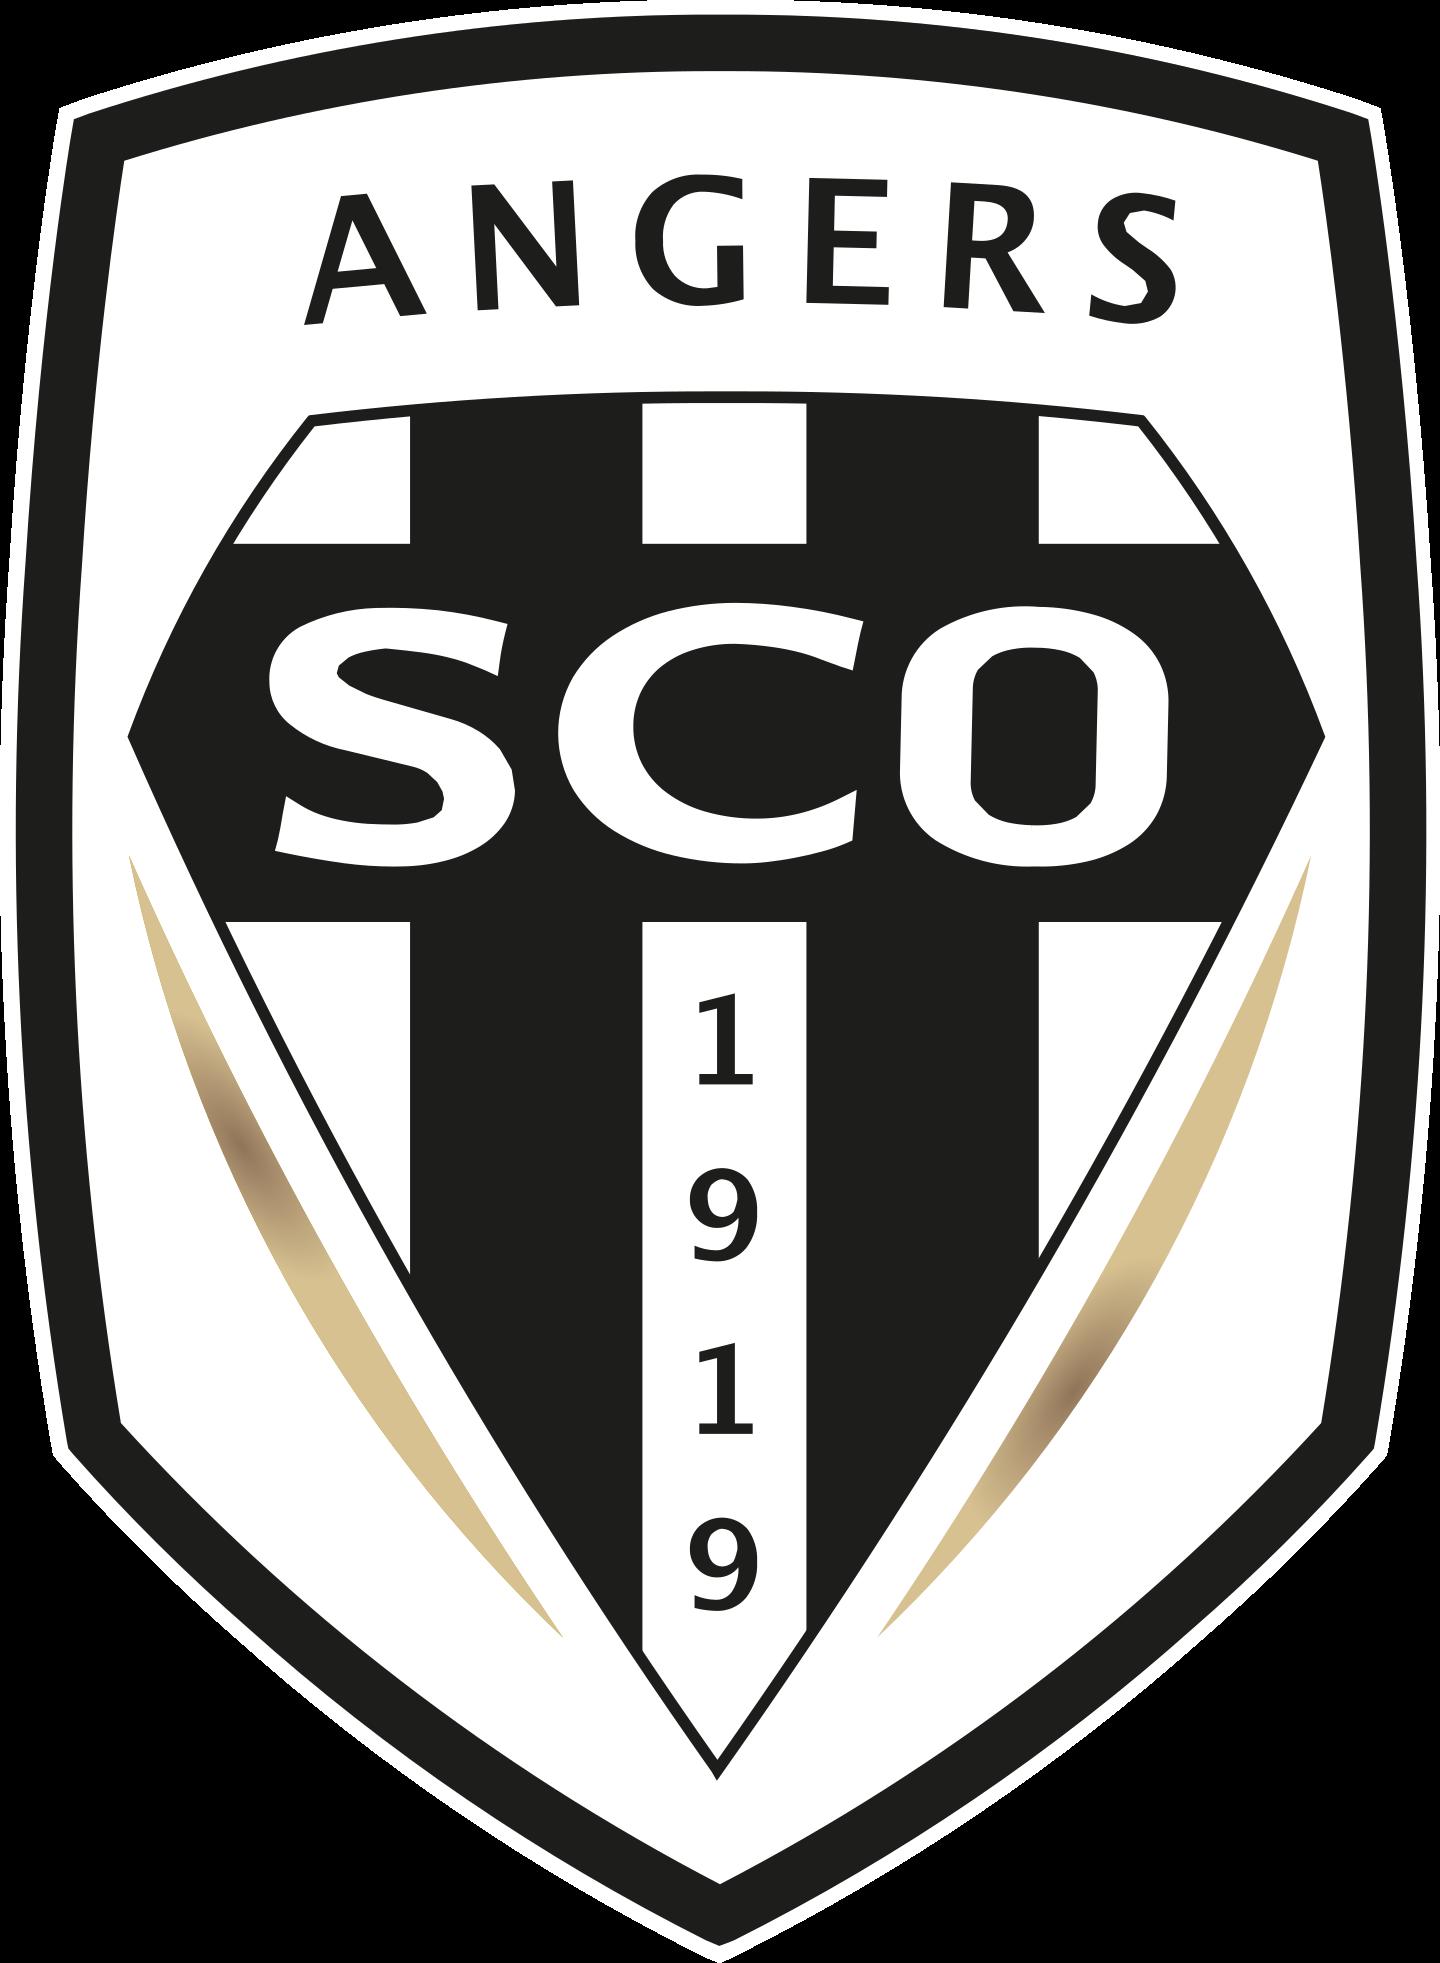 angers sco logo 2 - Angers SCO Logo